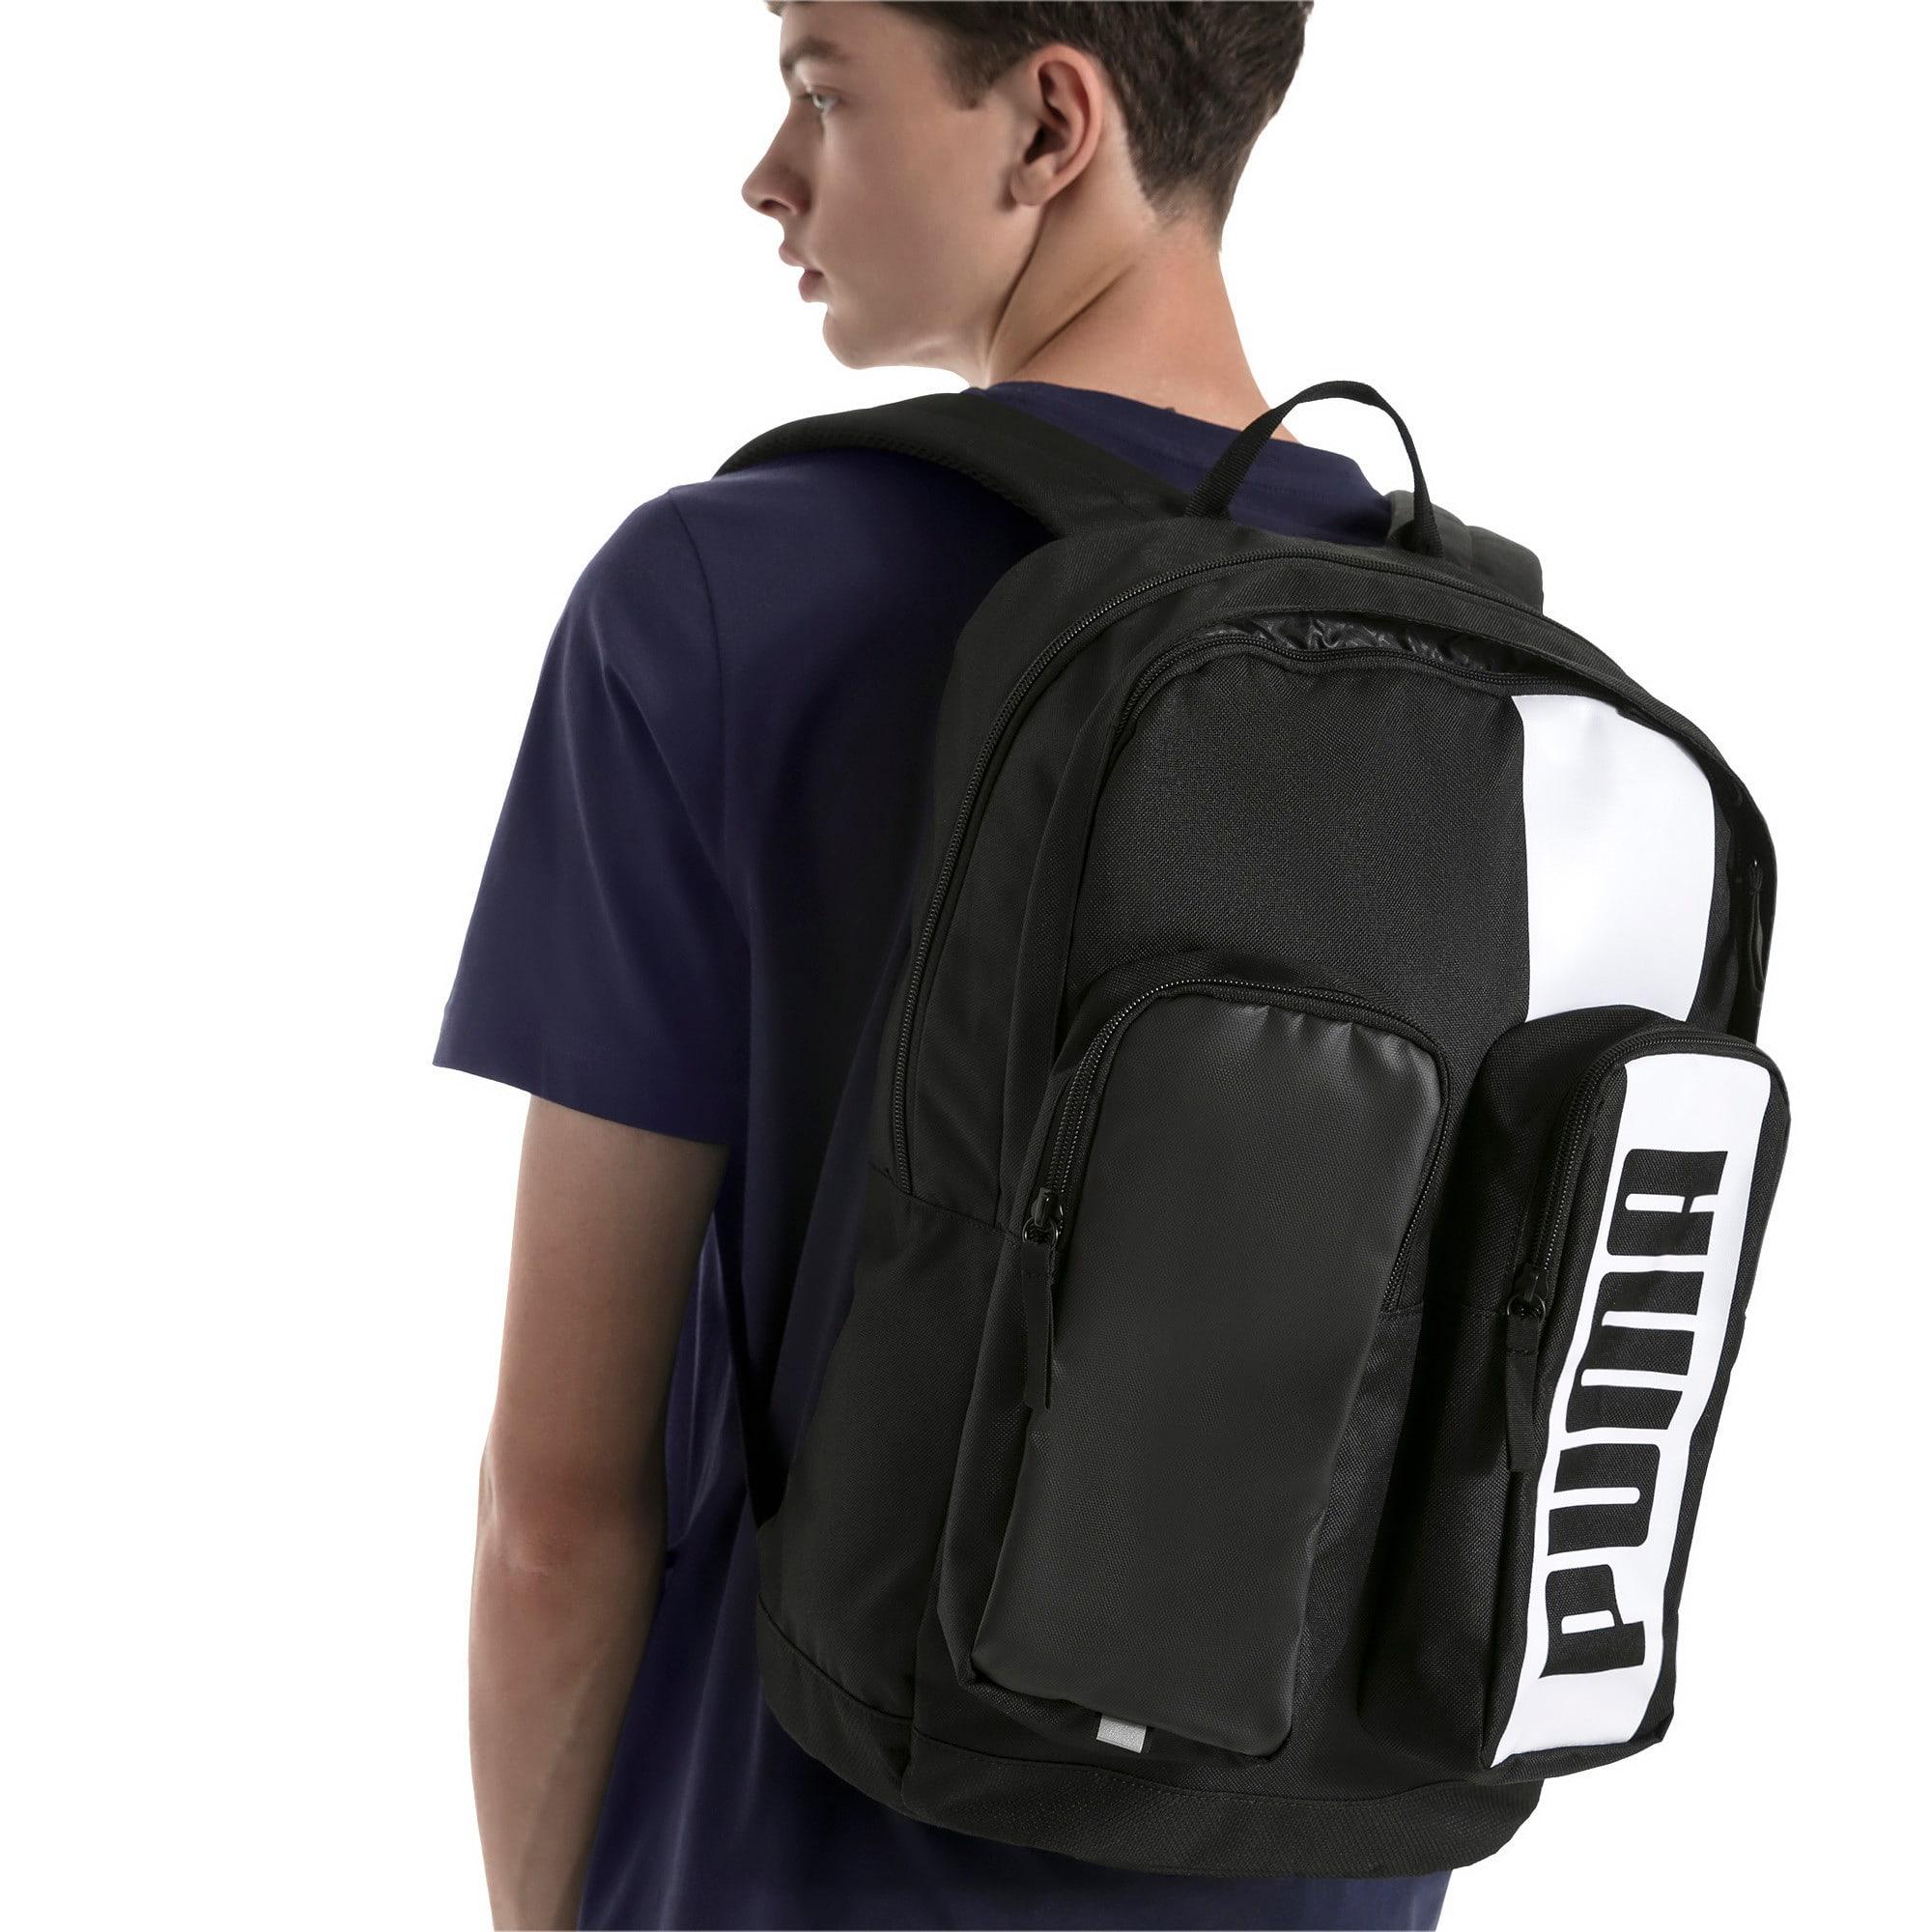 Thumbnail 2 of Deck Backpack II, Puma Black, medium